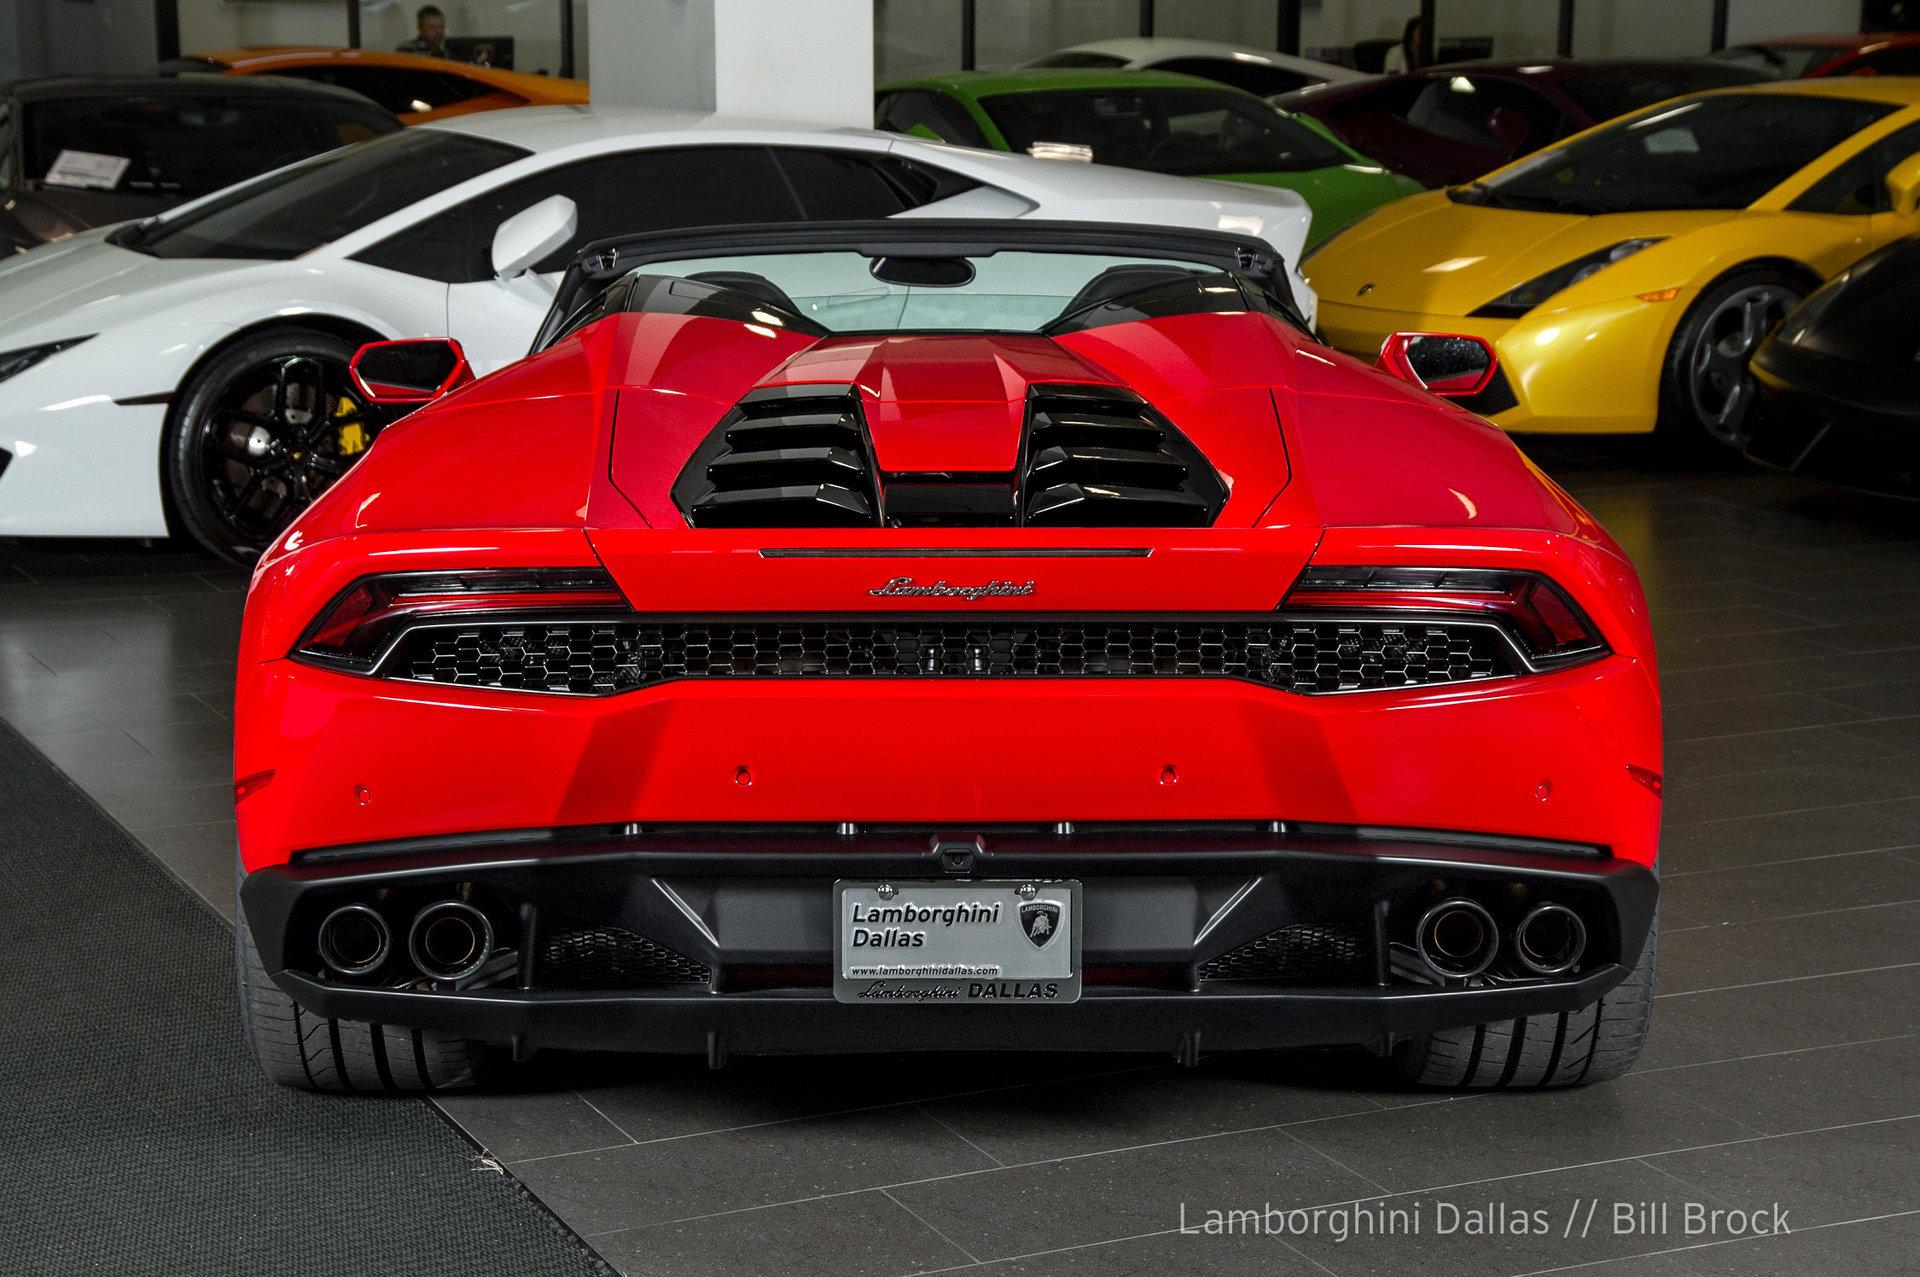 Lamborghini Huracan Spyder For Sale